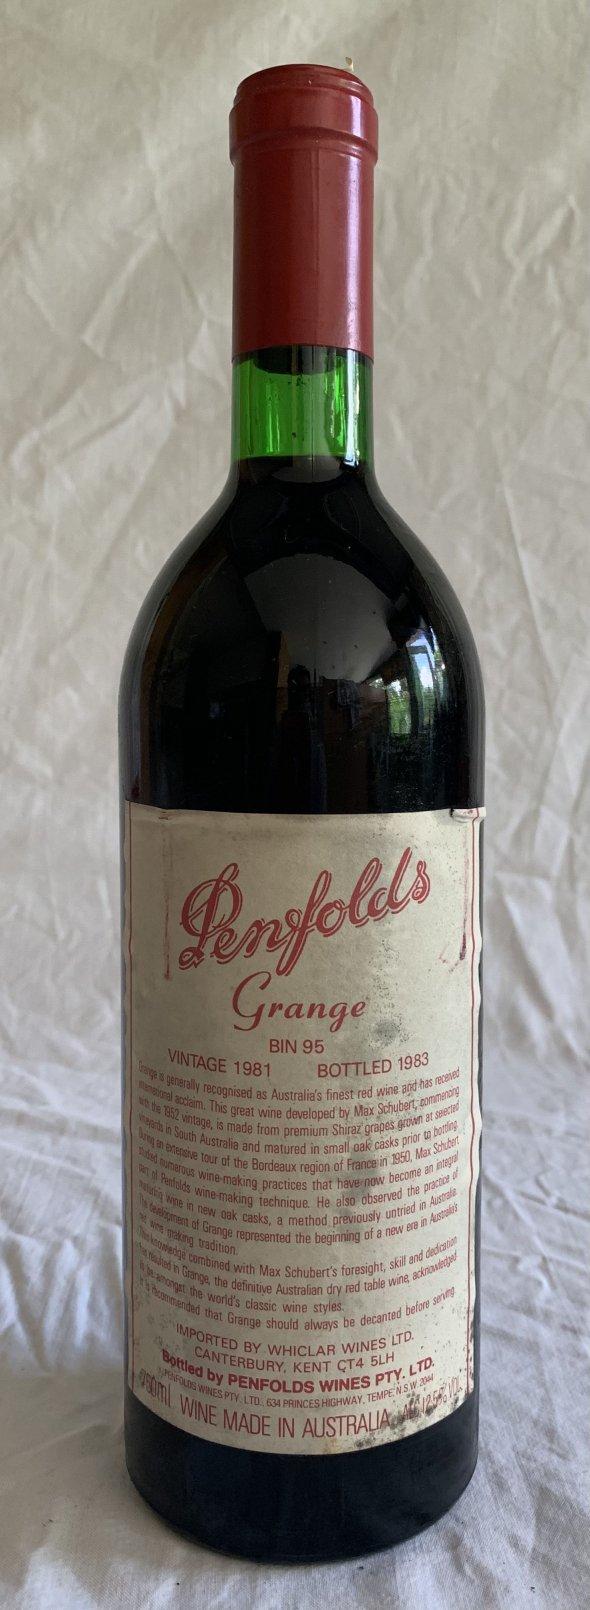 Penfolds, Grange Bin 95, South Australia